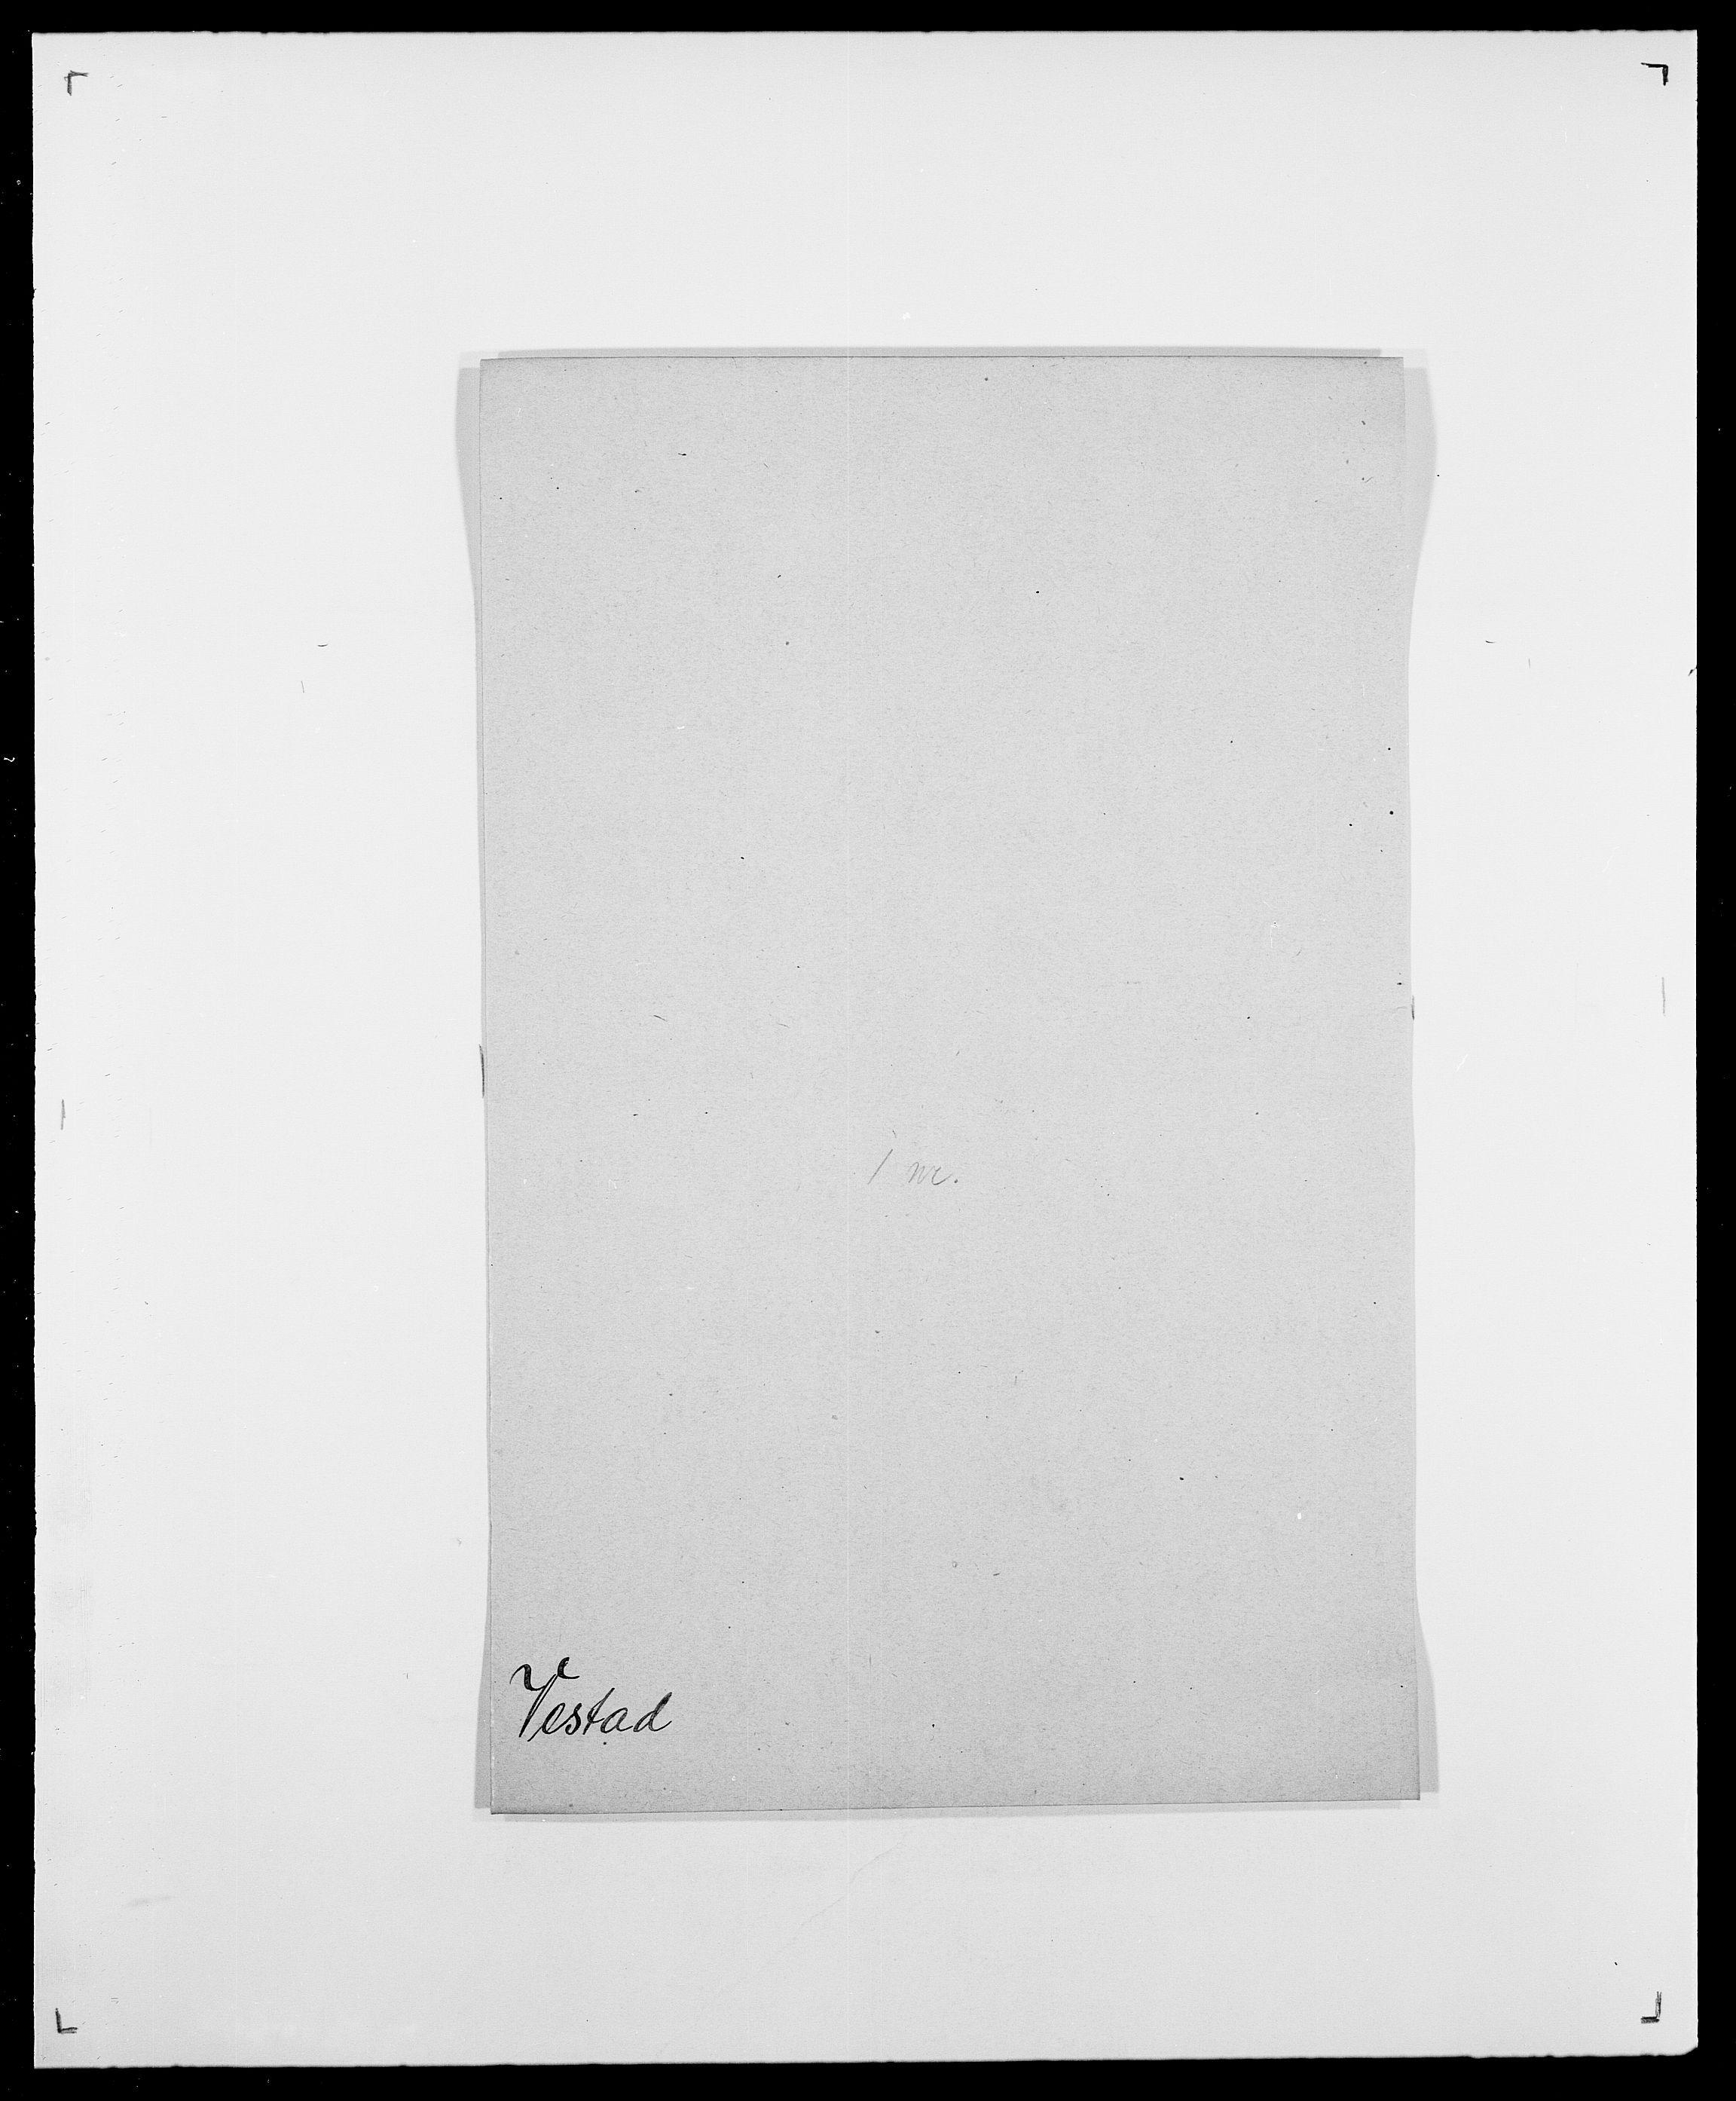 SAO, Delgobe, Charles Antoine - samling, D/Da/L0041: Vemmestad - Viker, s. 251